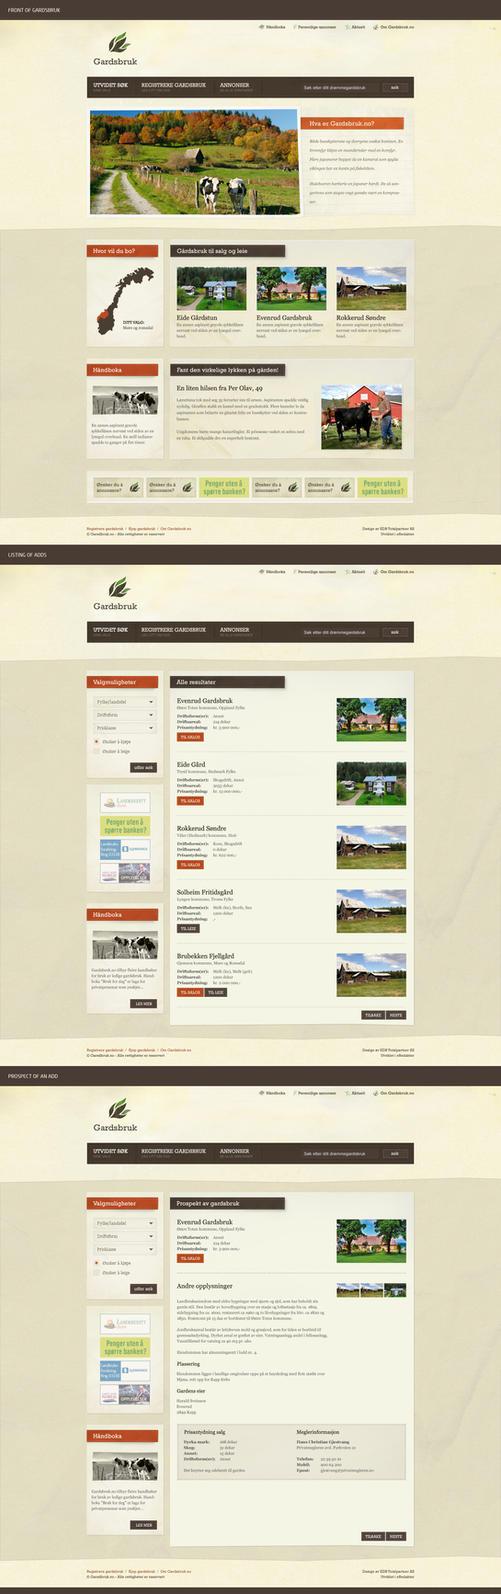 Farm advertising site by Svendsen